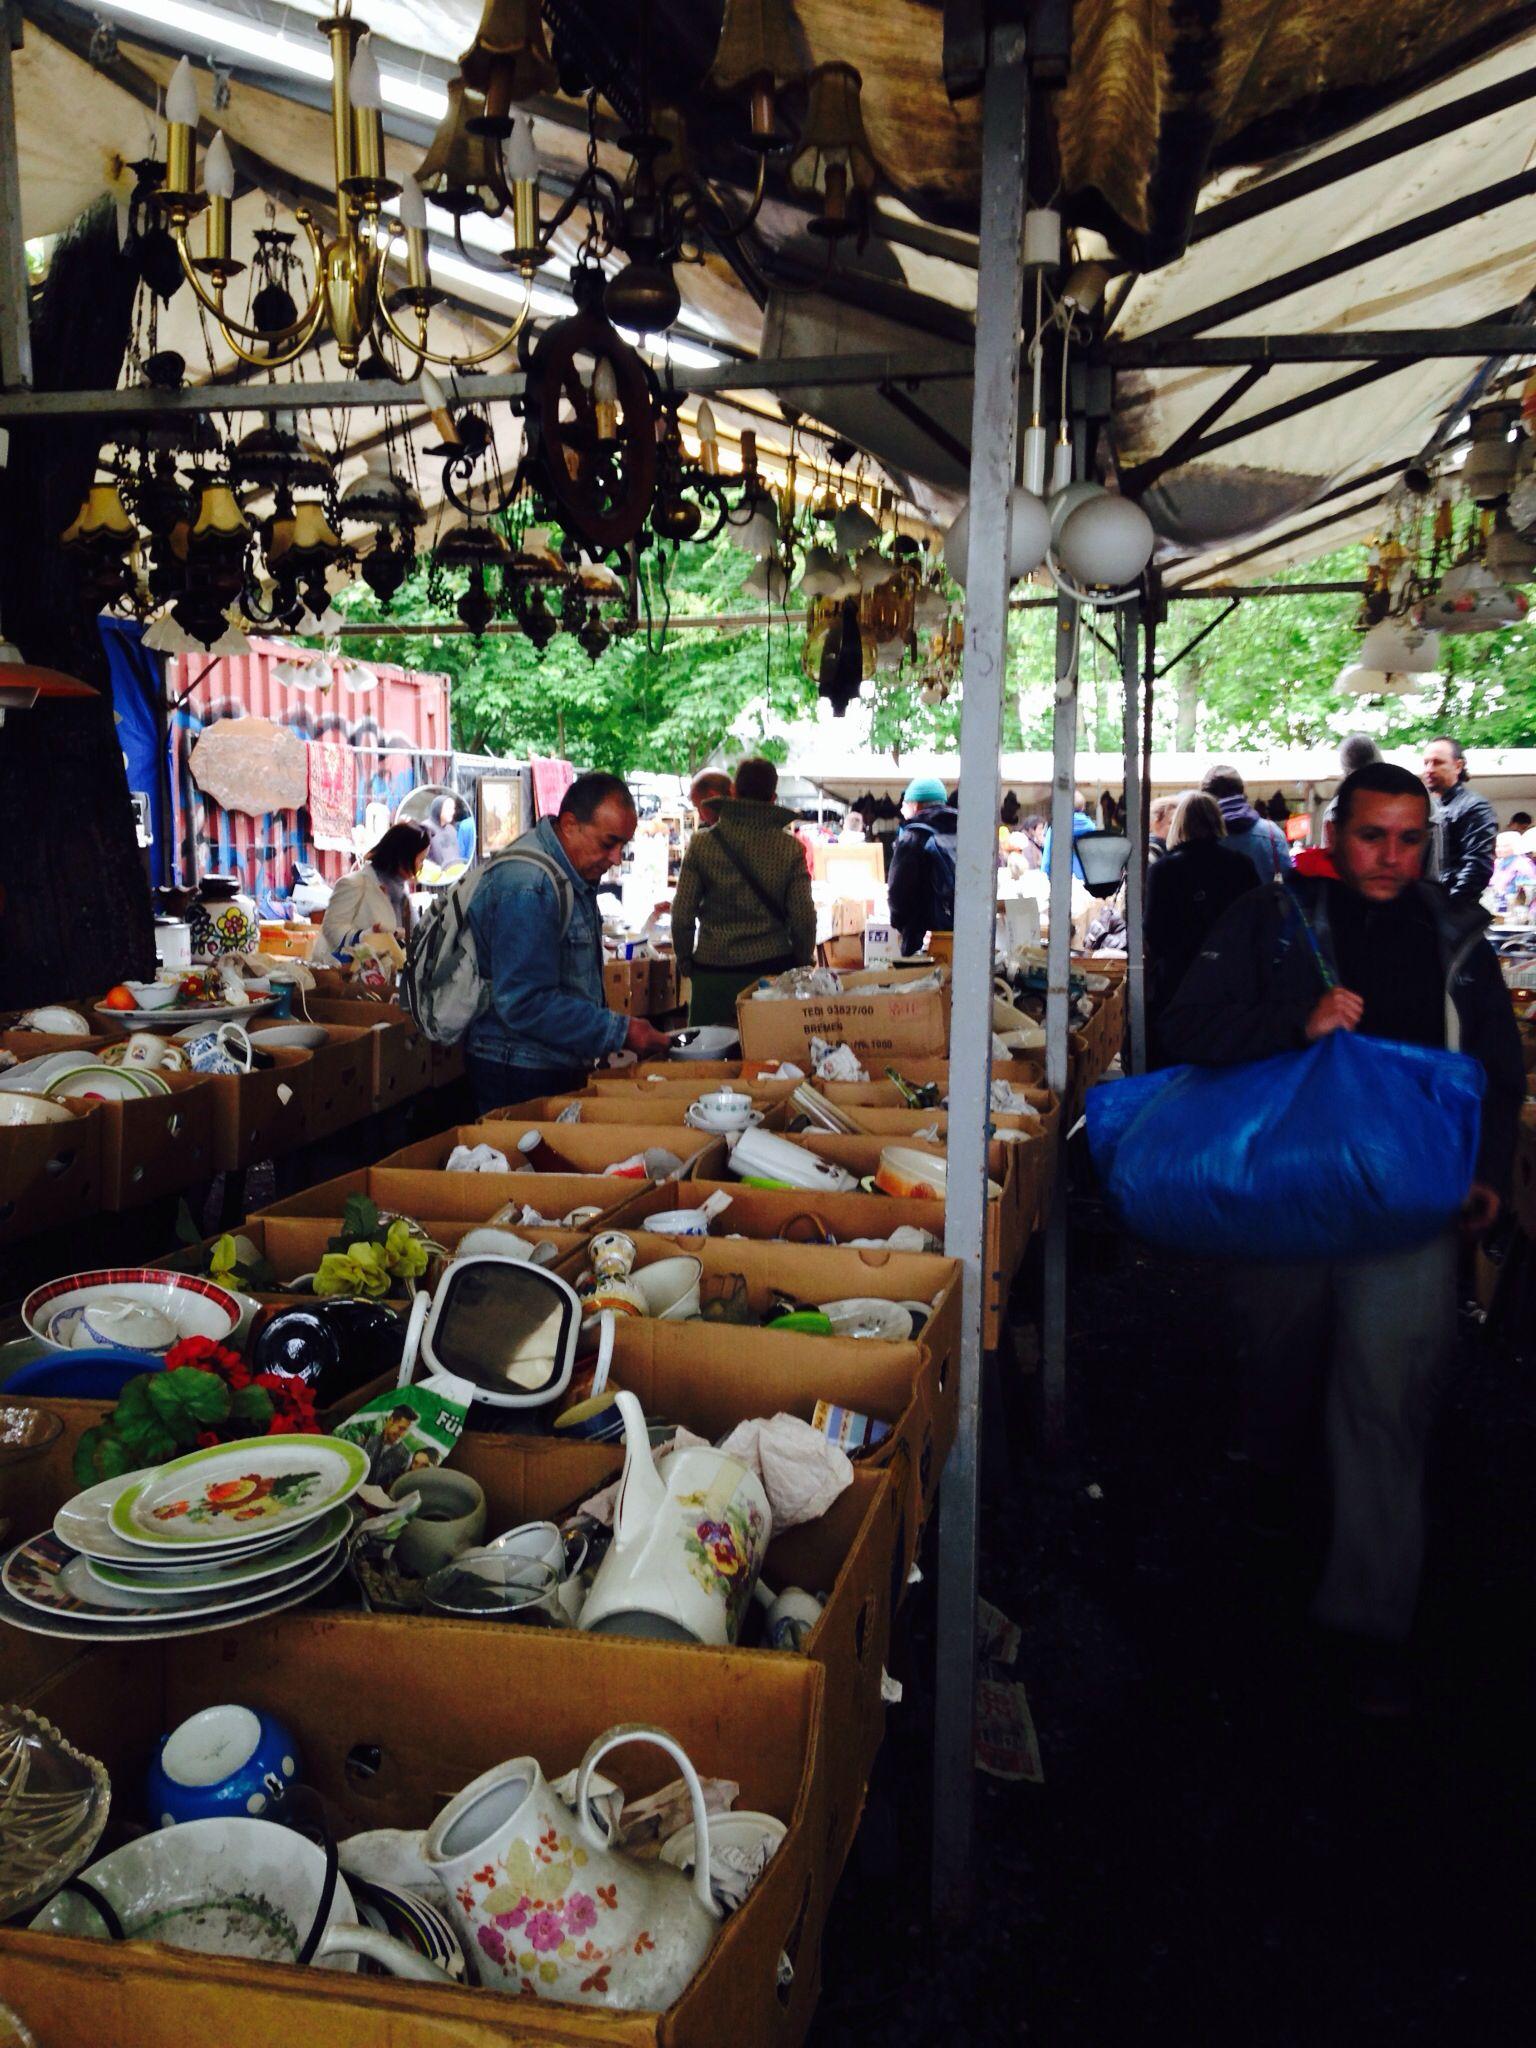 Mauer park flea market every Sunday.